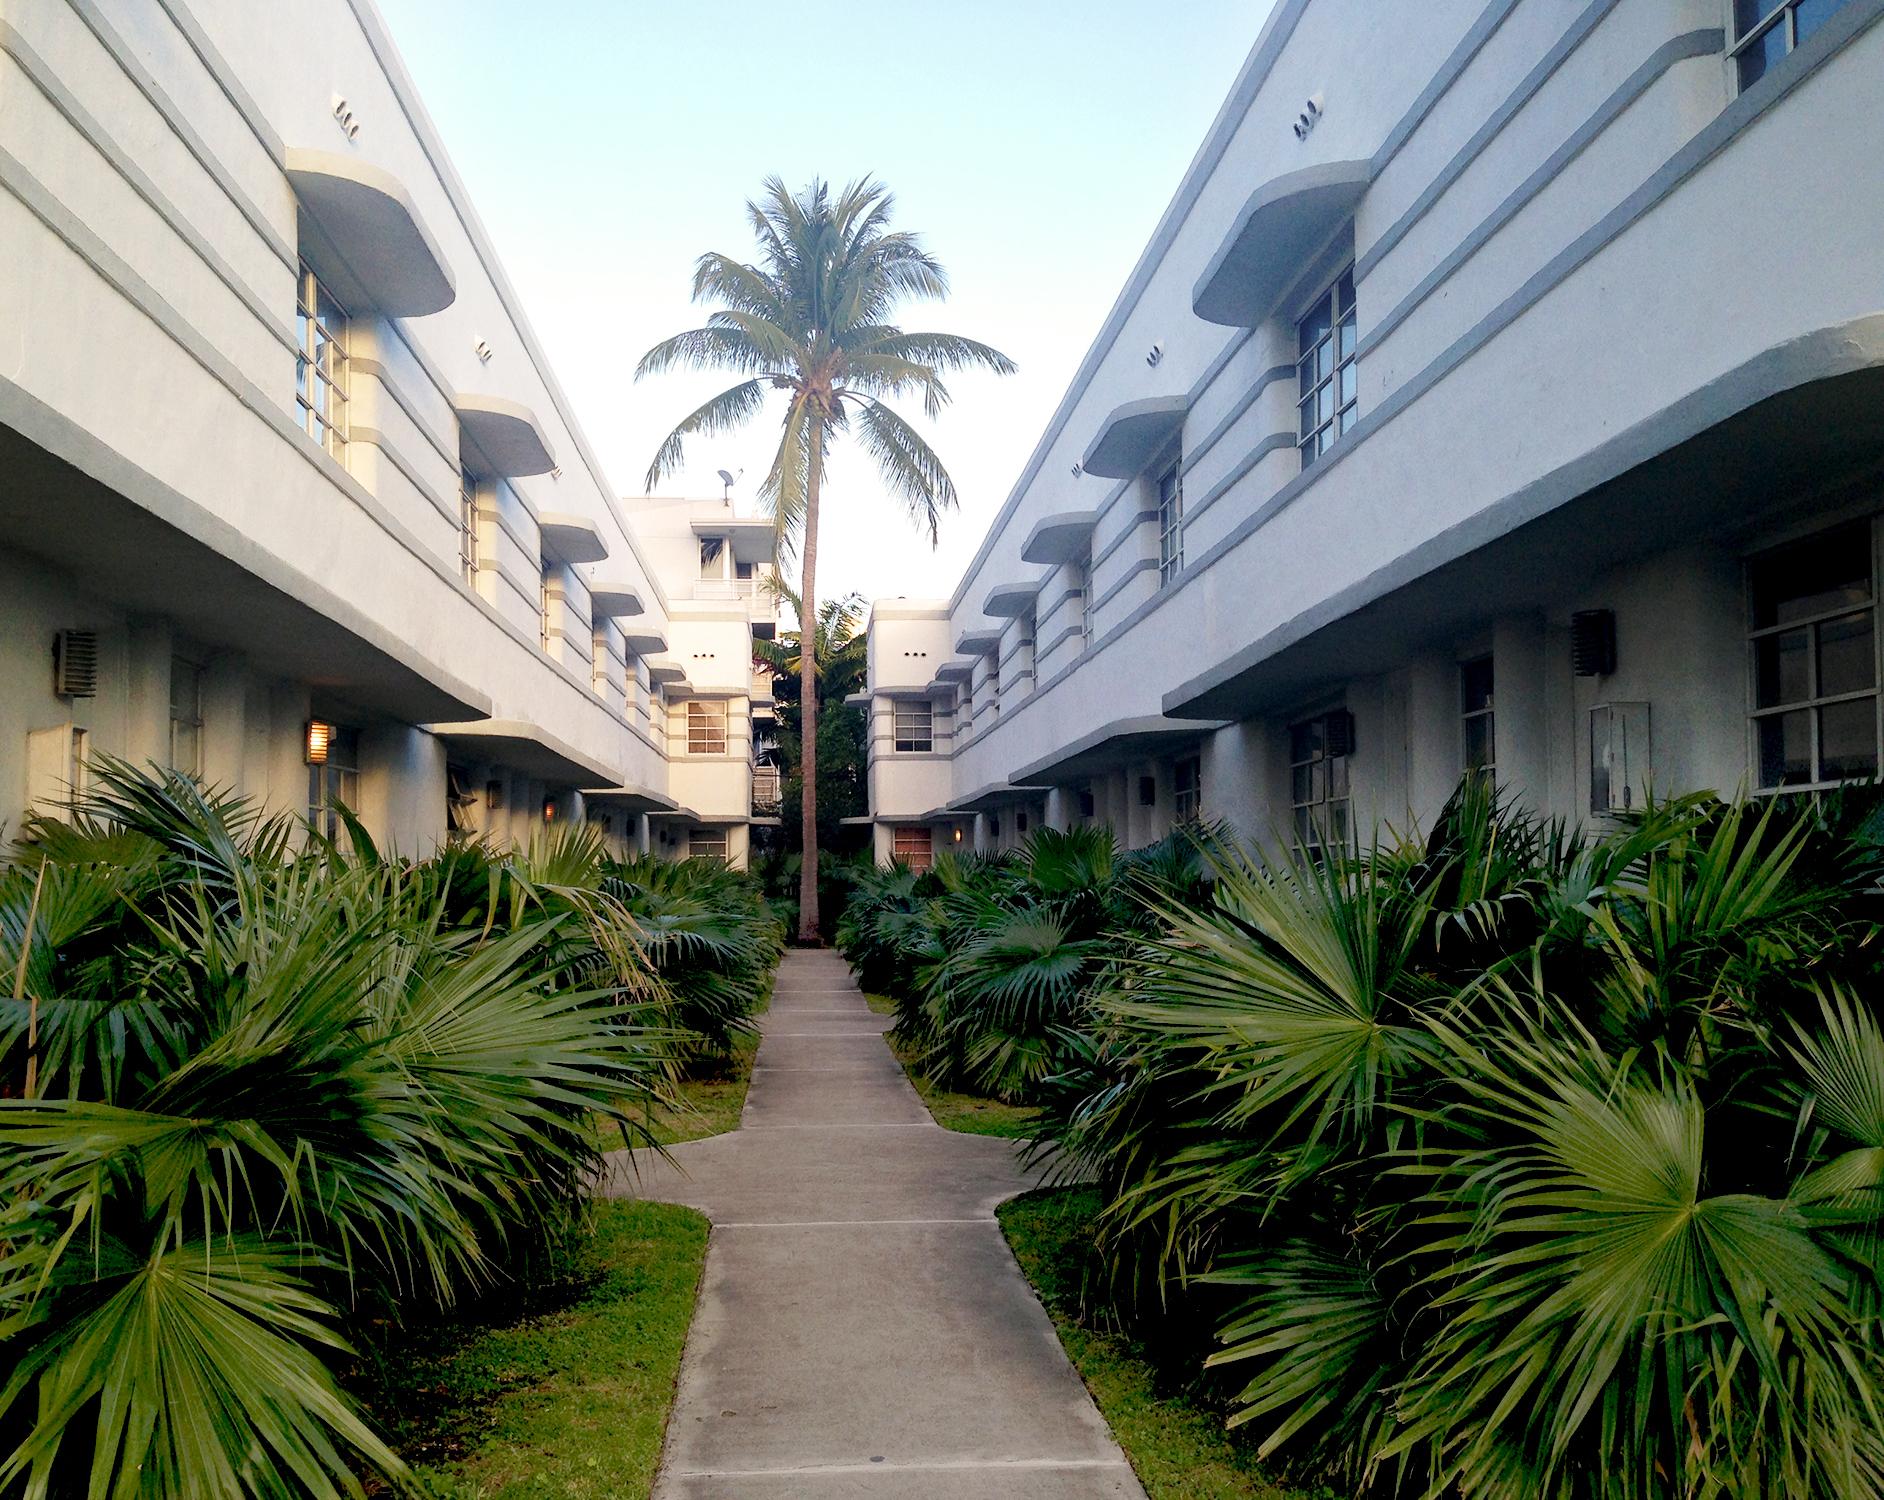 Art deco buildings in Miami, Florida / Darker than Green